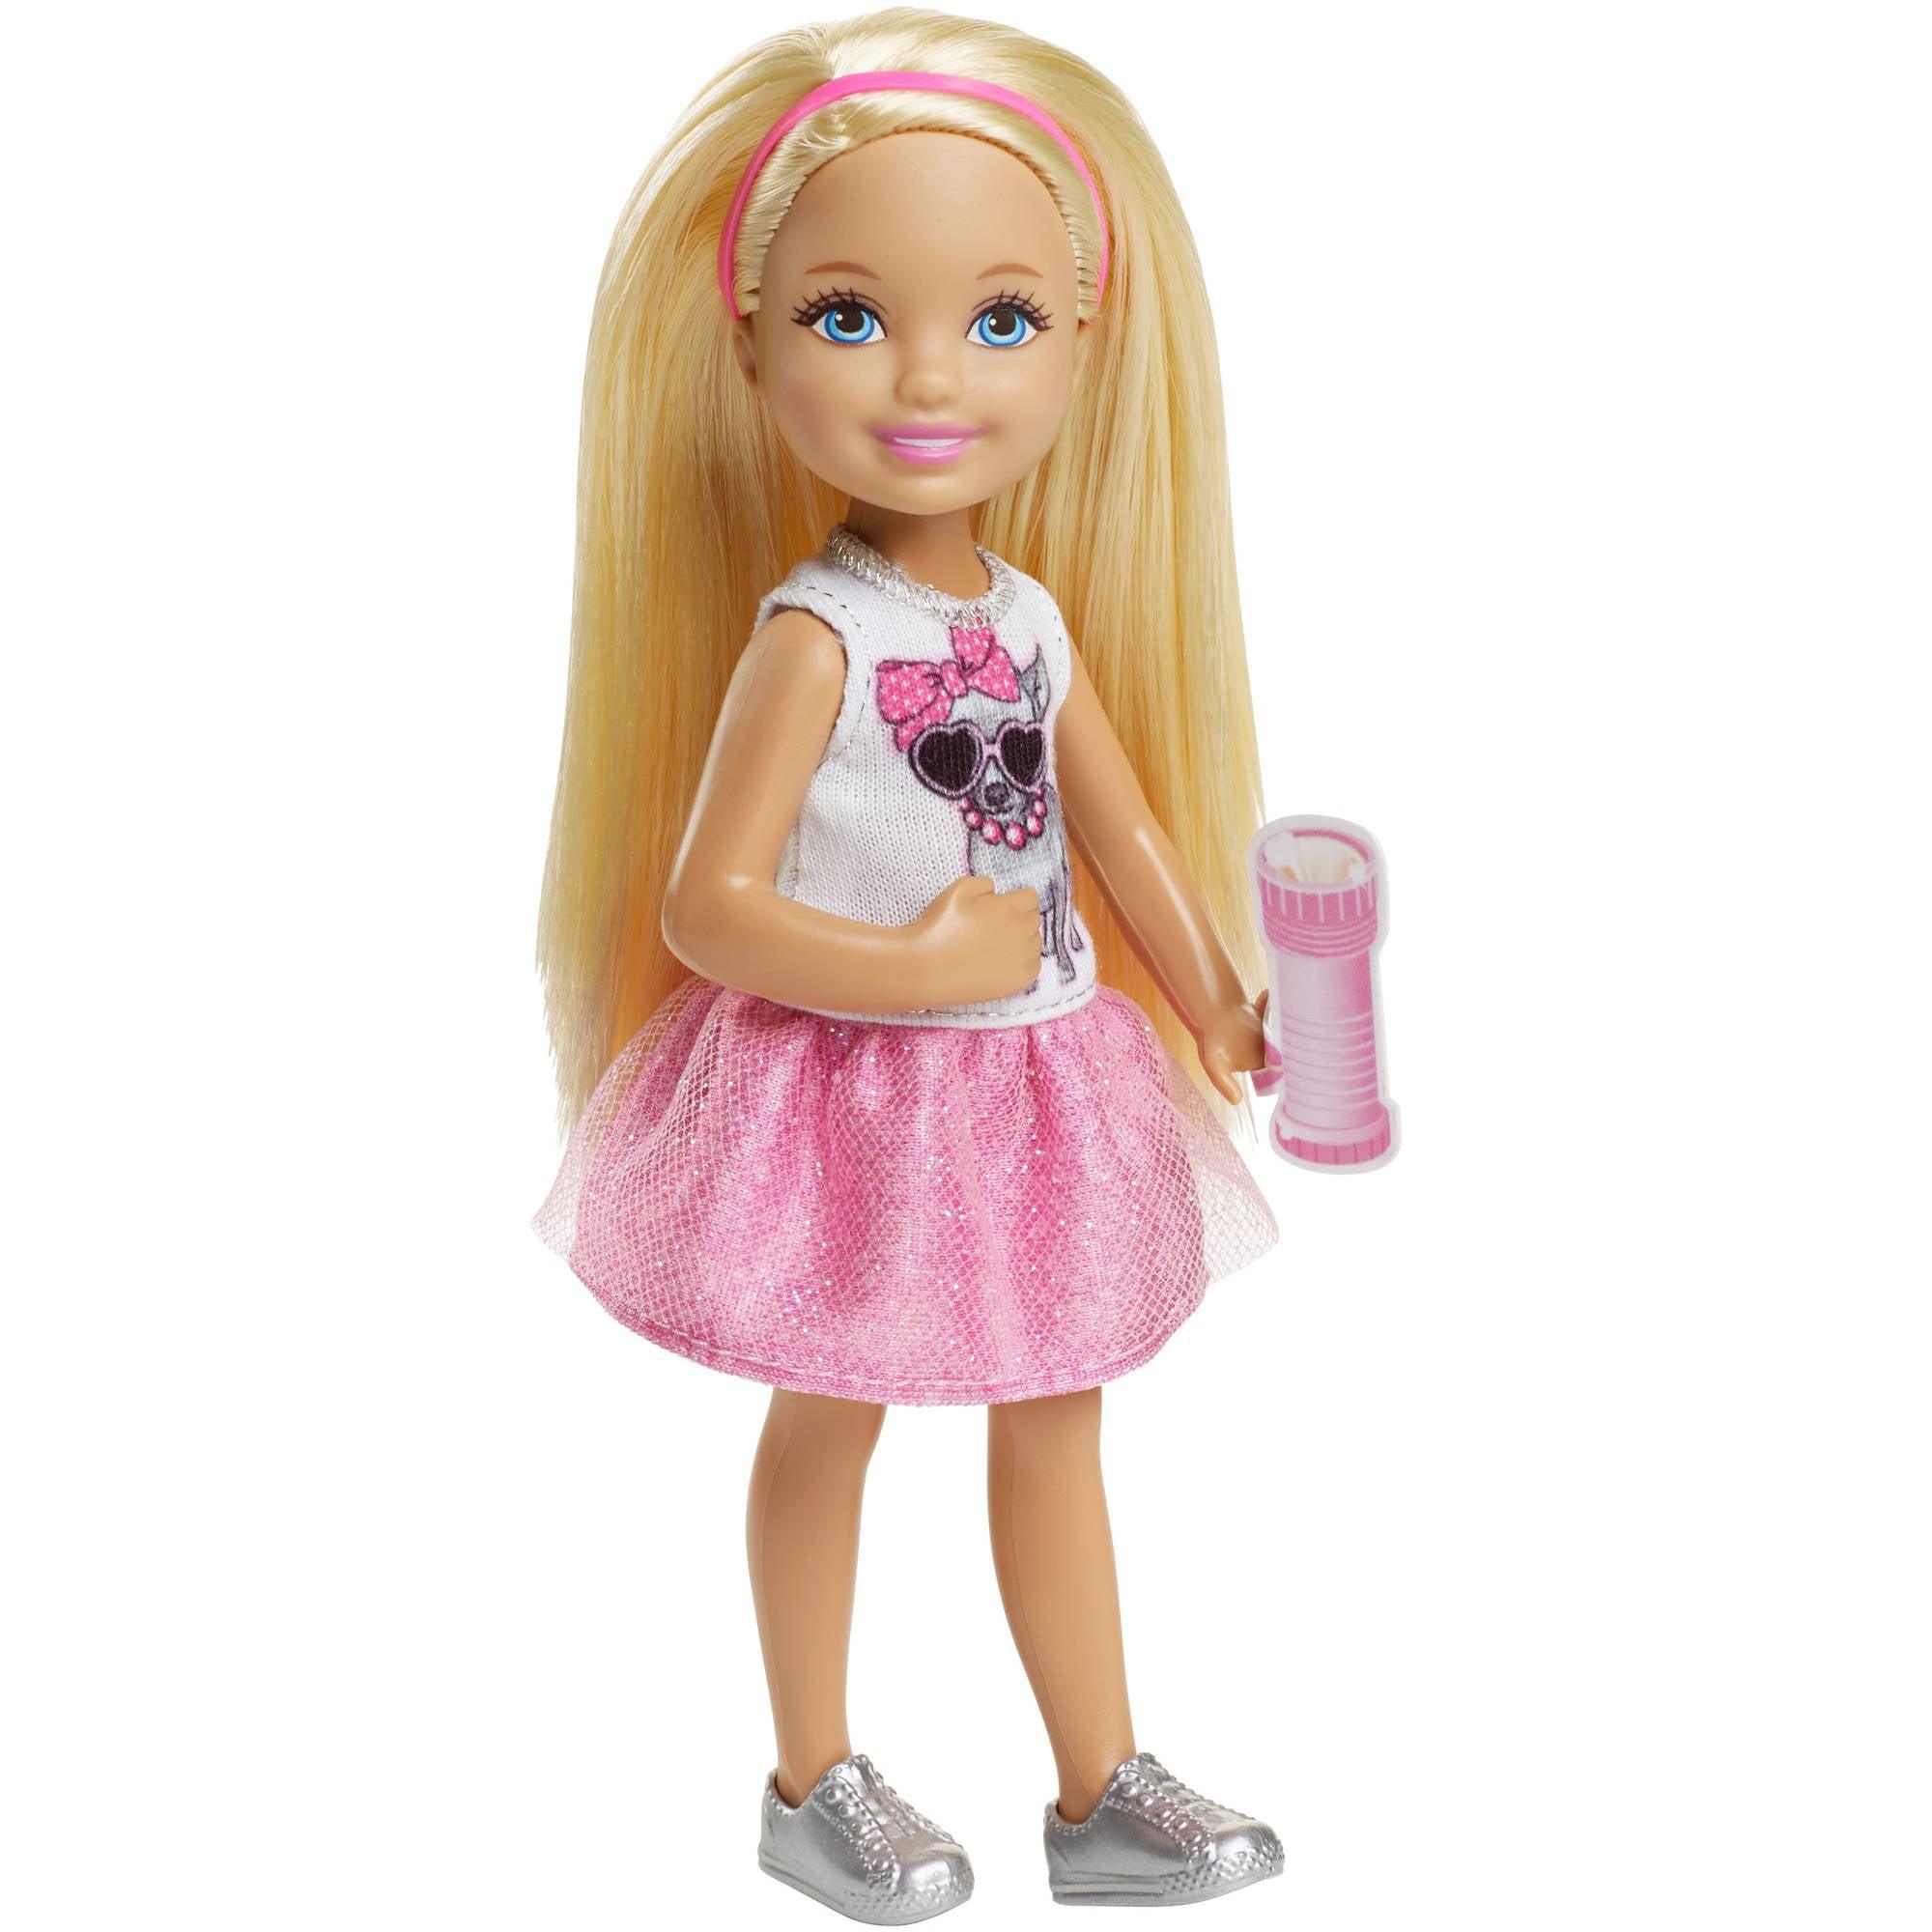 Barbie Chelsea Doll - Walmart.com